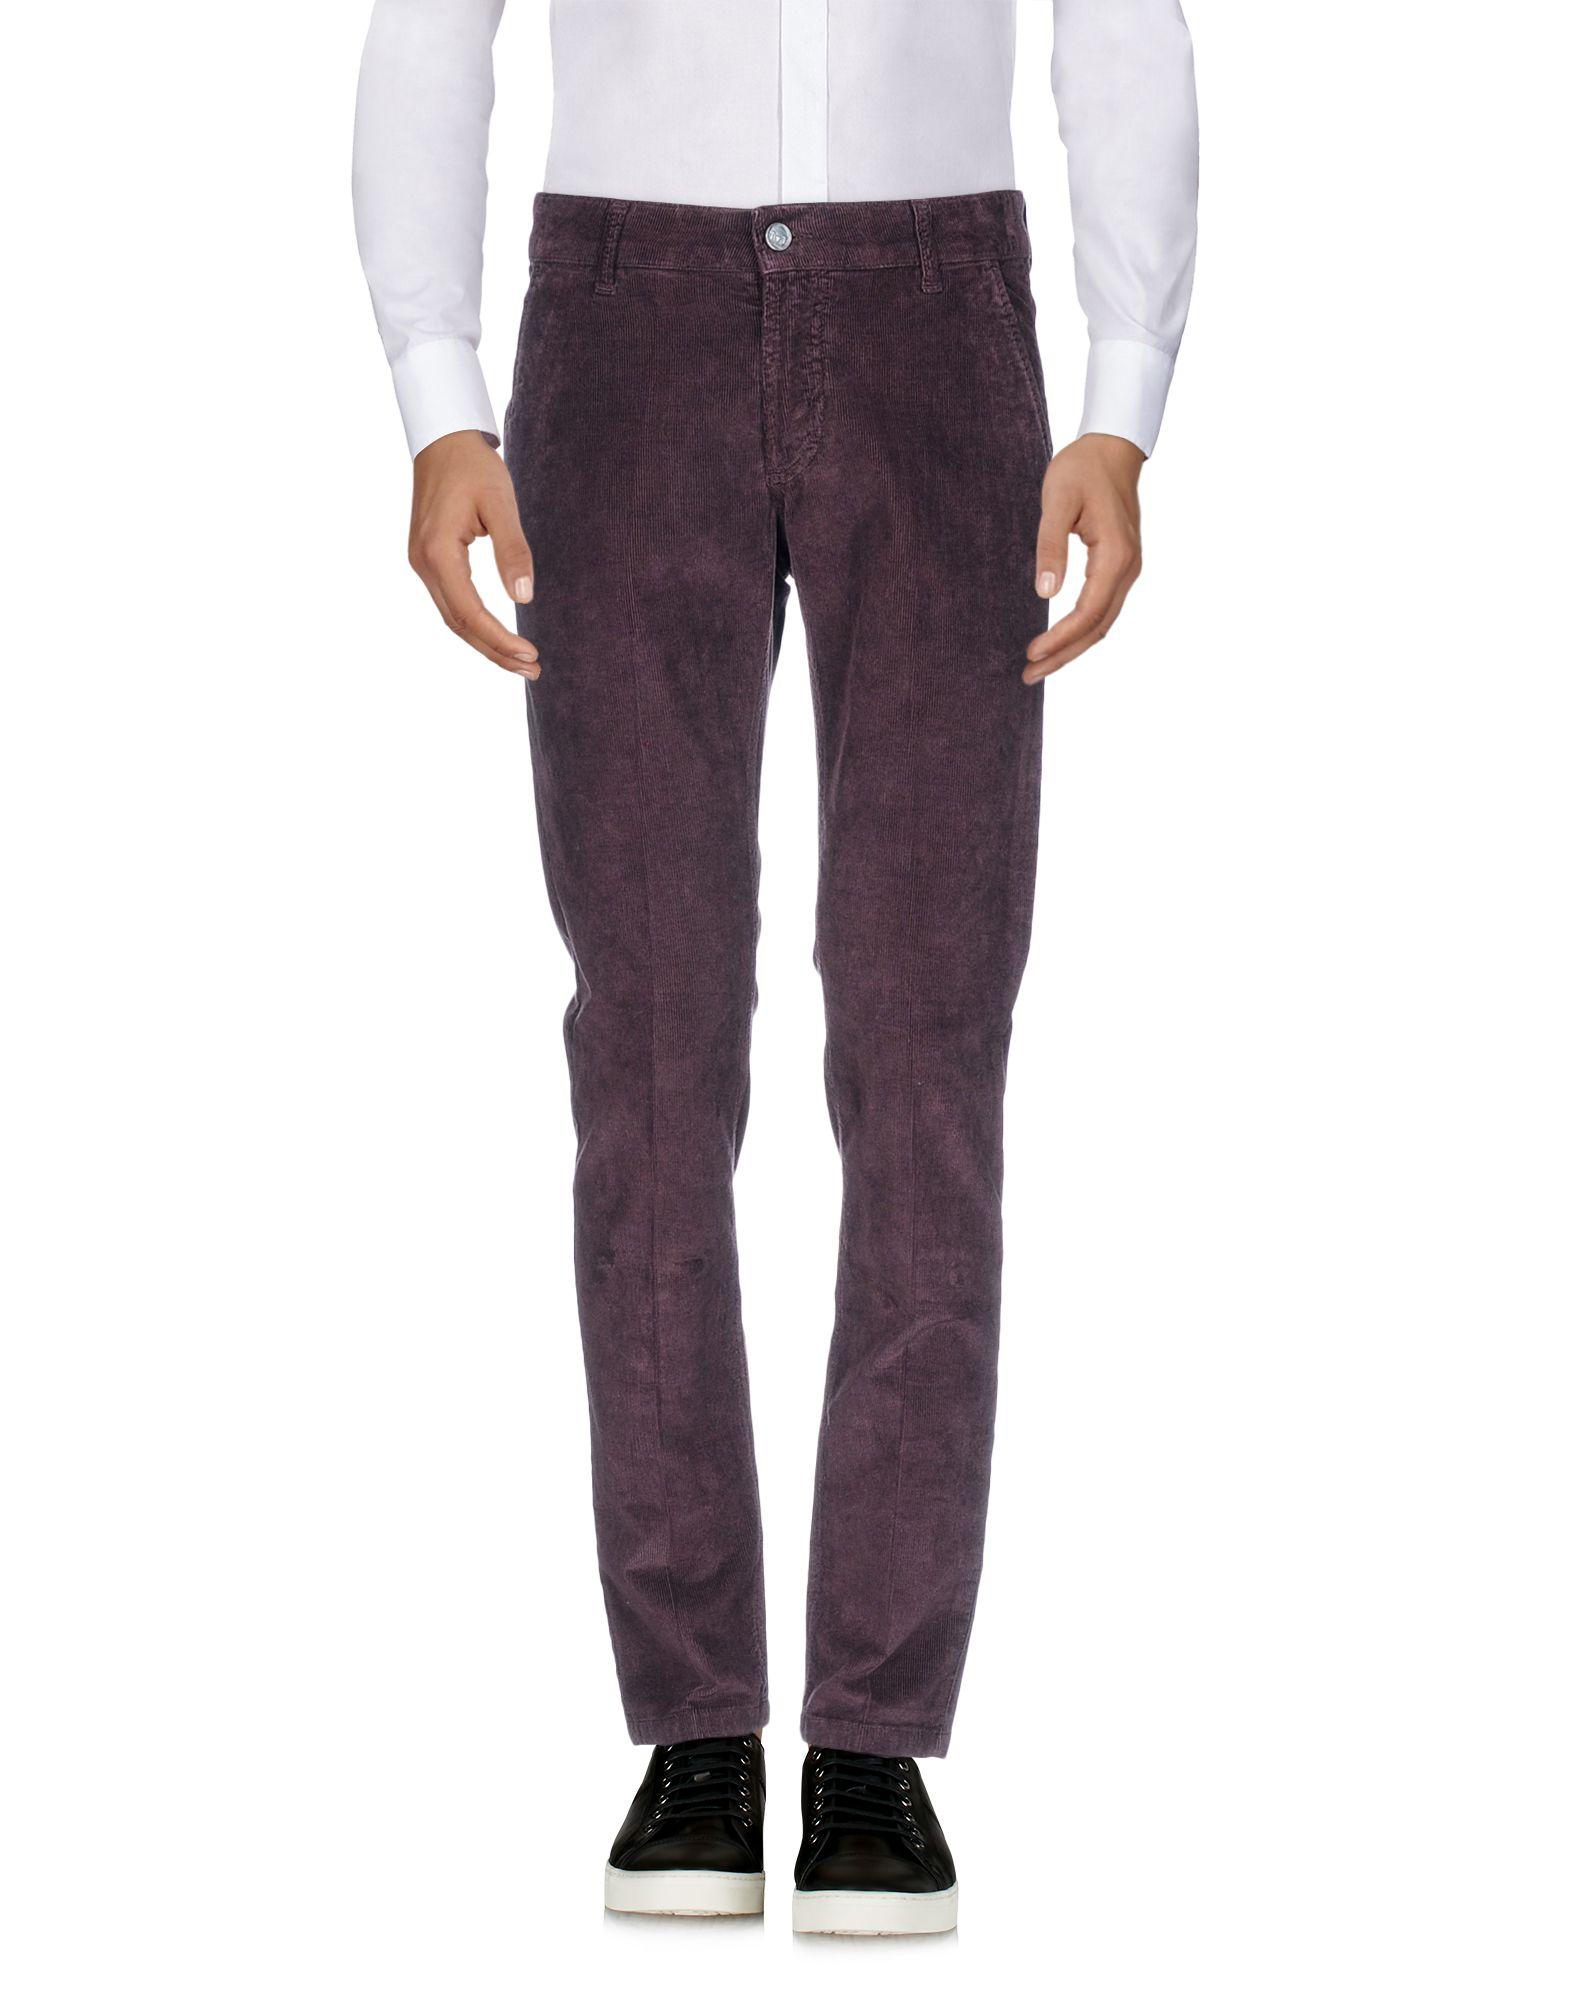 ENTRE AMIS Повседневные брюки amis st30p white